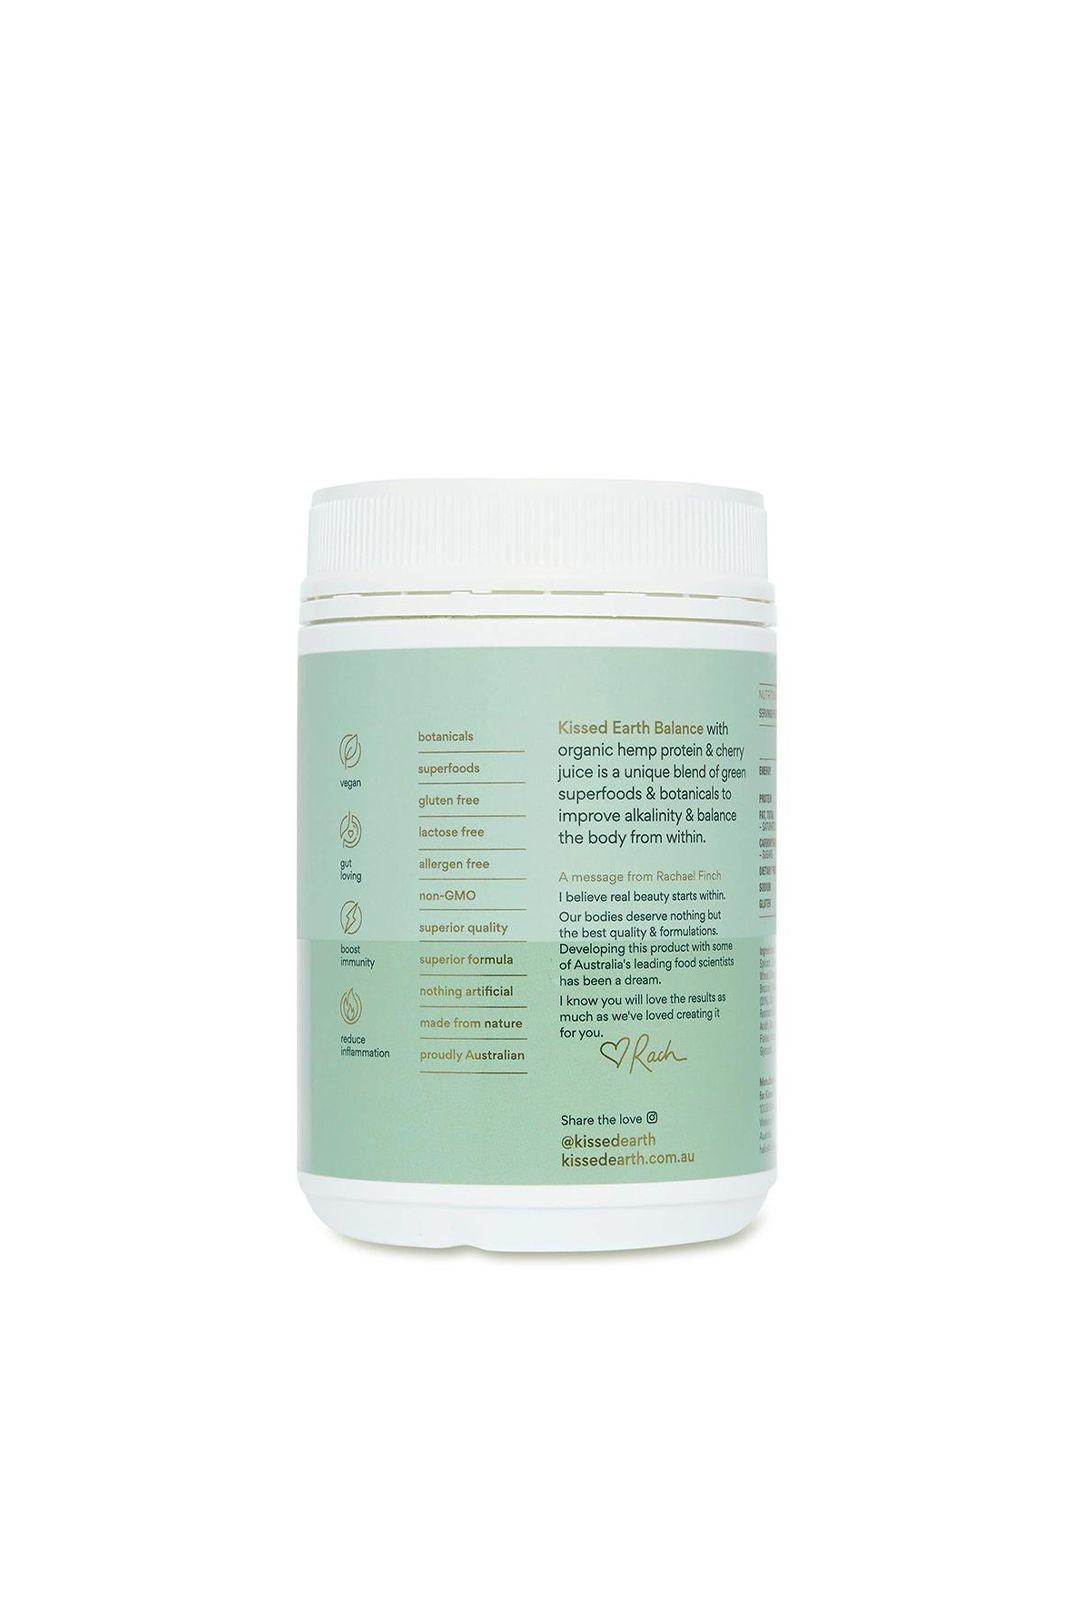 kissed-earth-balance-organic-hemp-protein-cherry-juice-alkalising-supplement-back